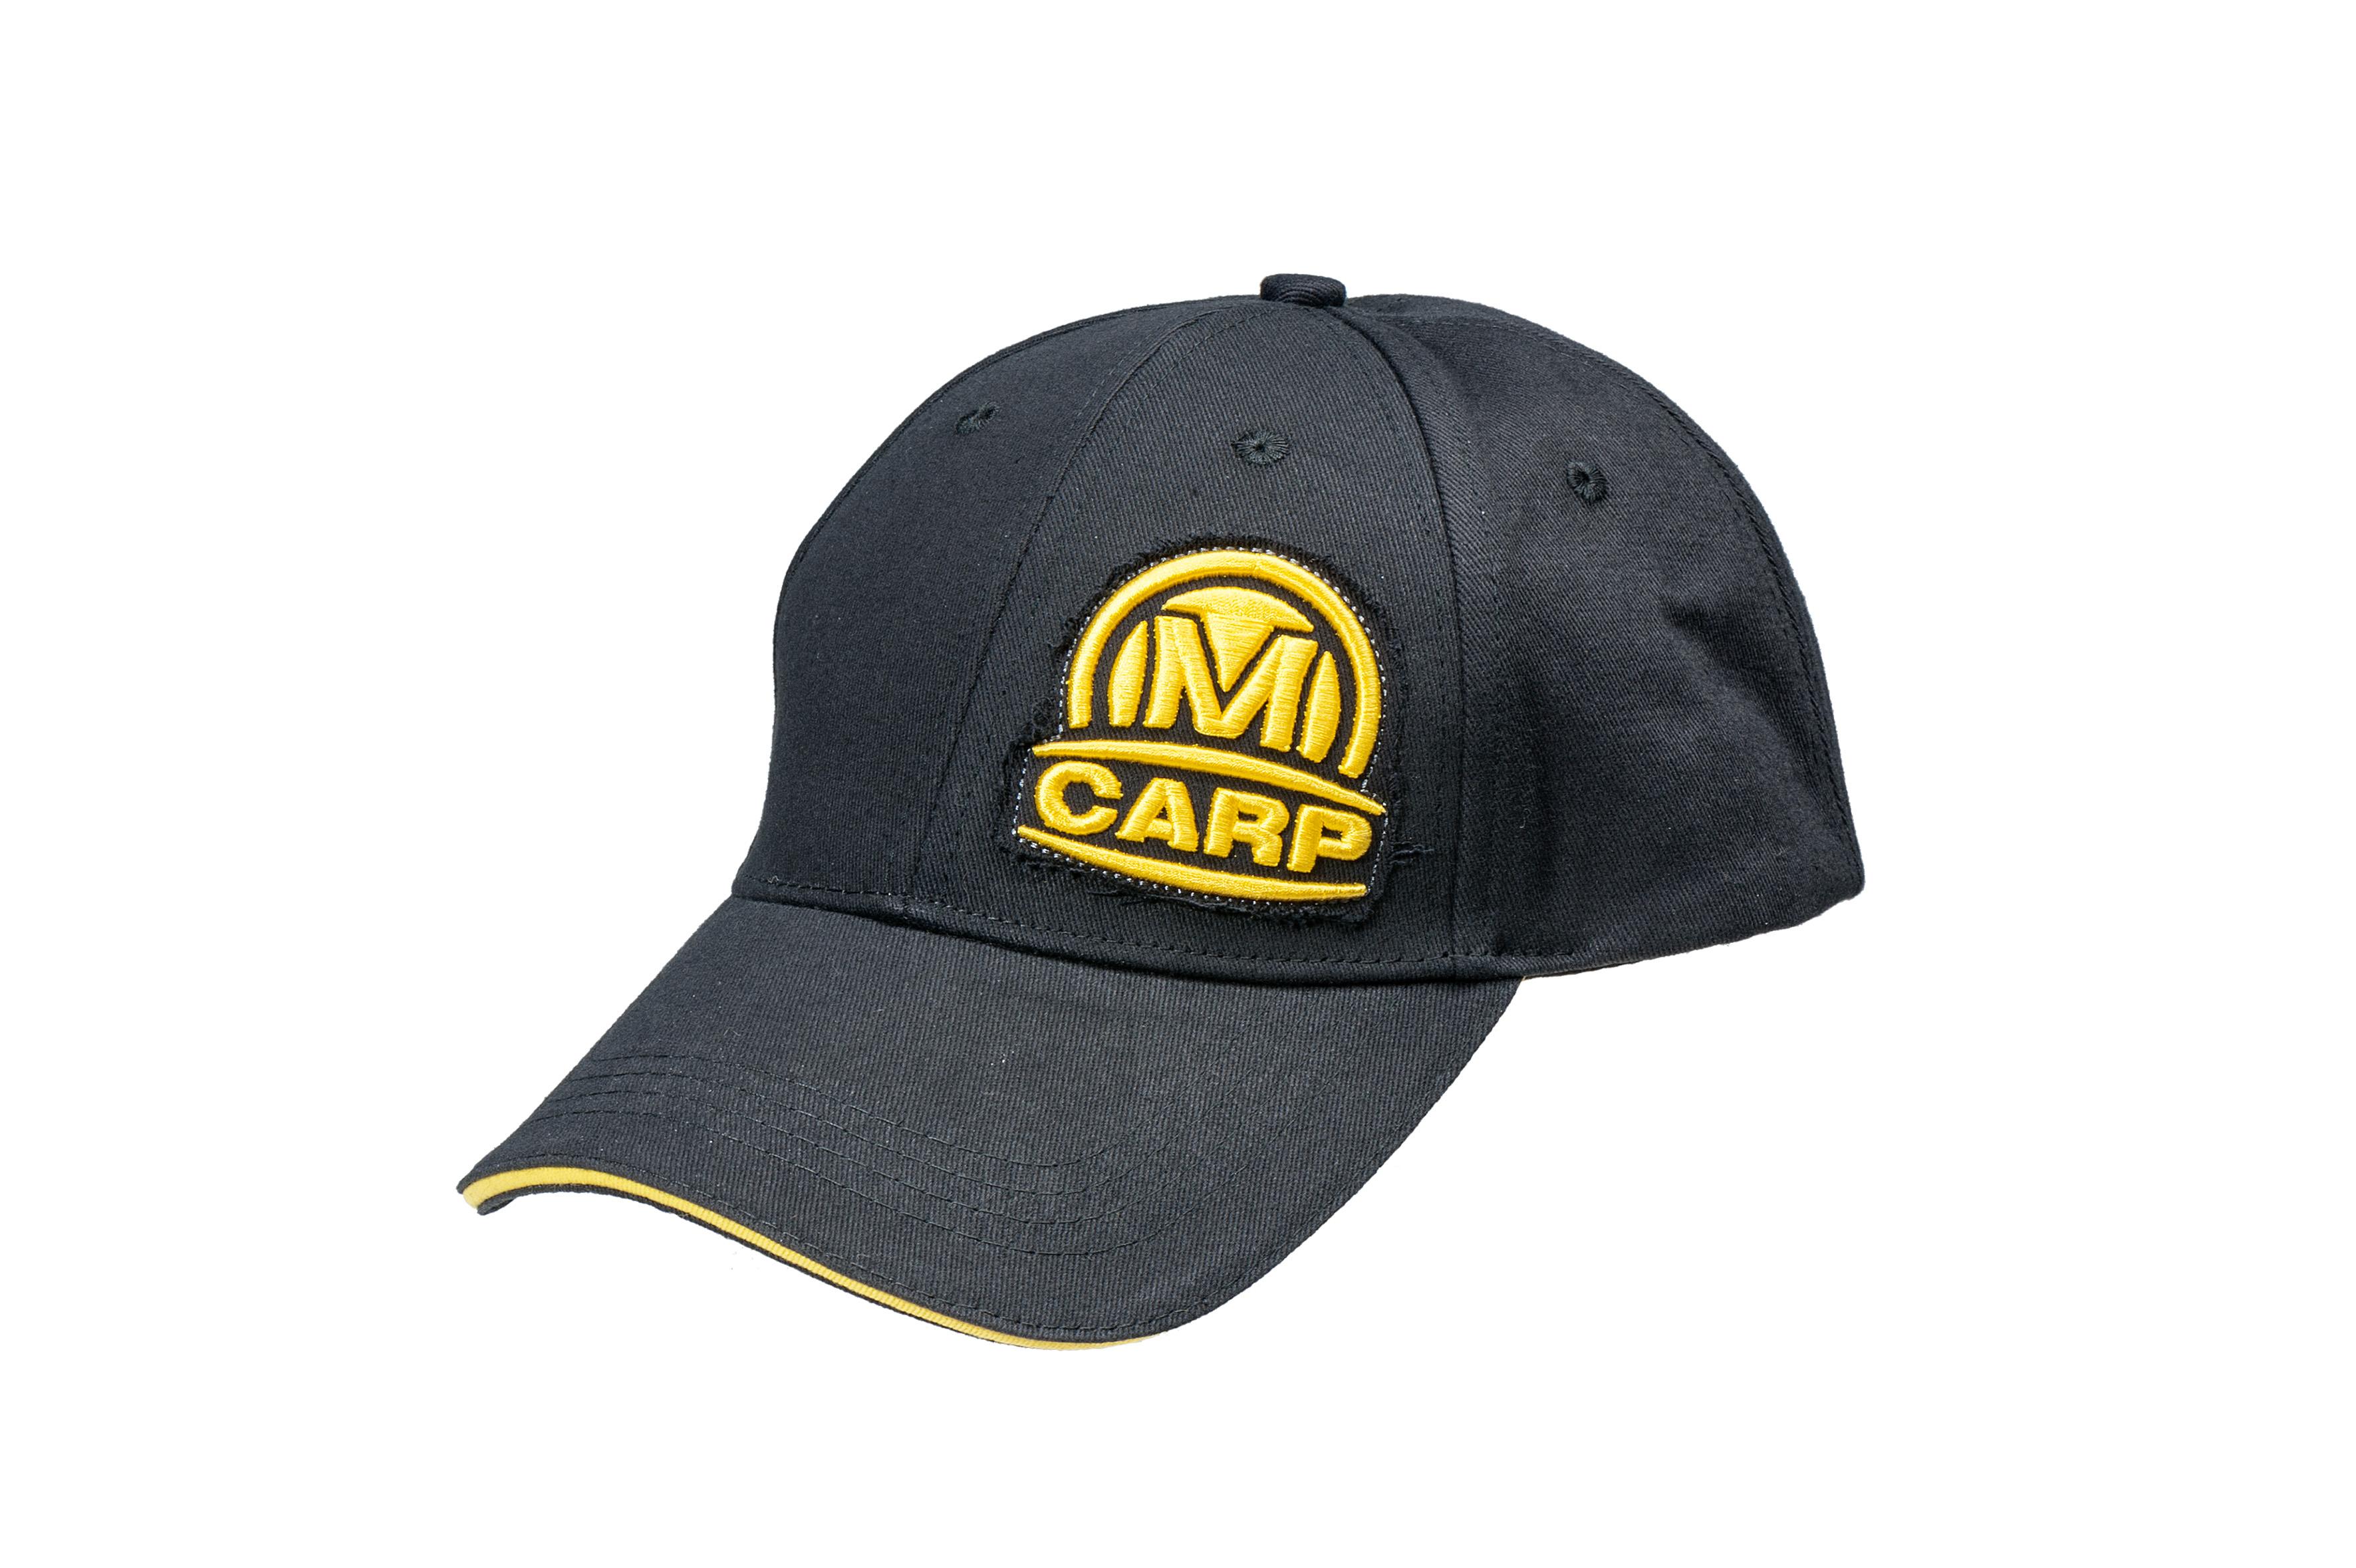 MIVARDI Čiapka - M-CARP team